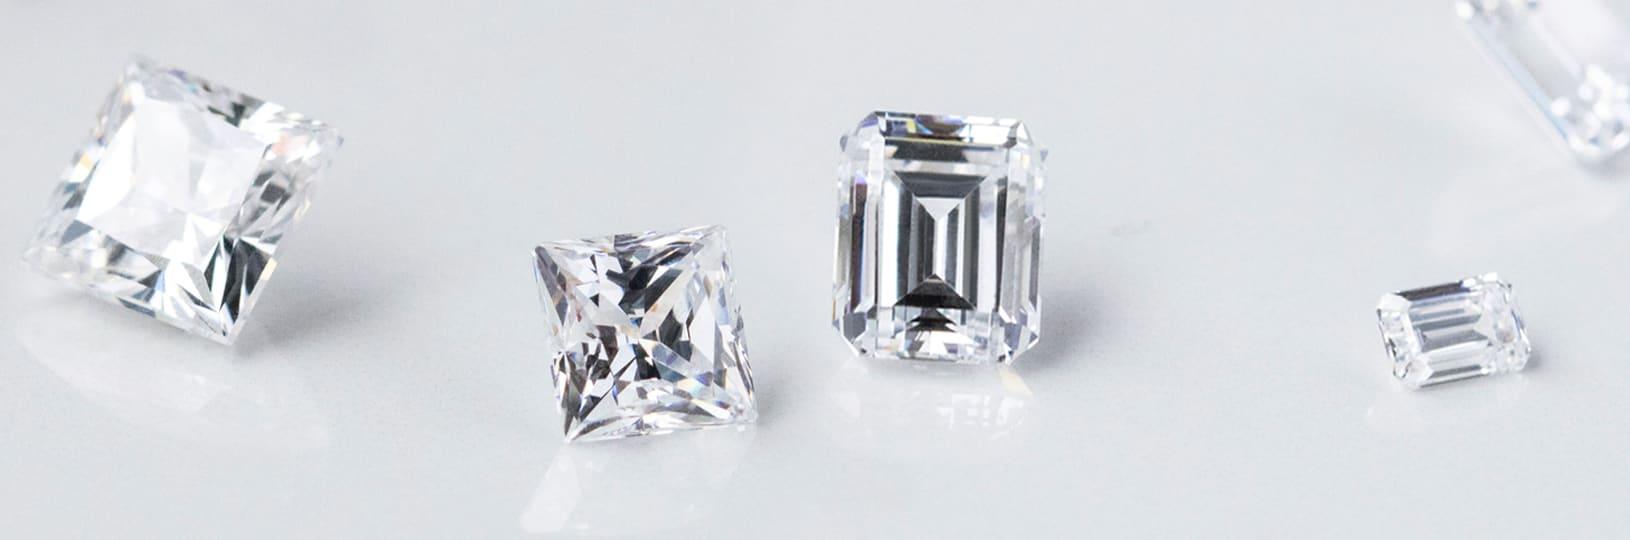 A variety of Nexus Diamond™ alternatives compared side by side